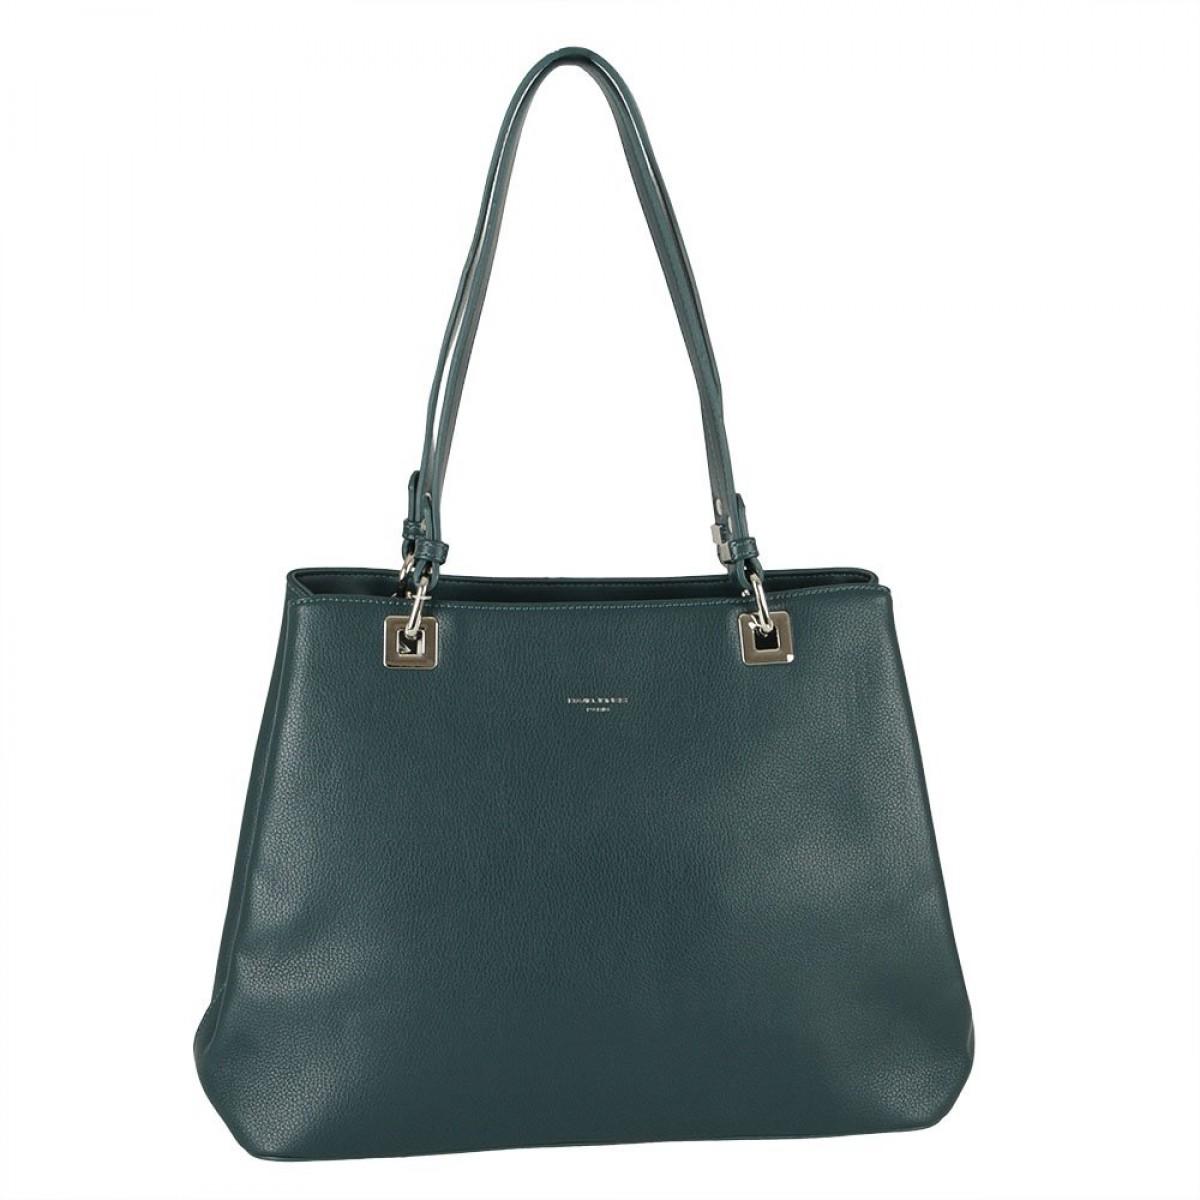 Жіноча сумка David Jones CM5879 PEACOCK BLUE